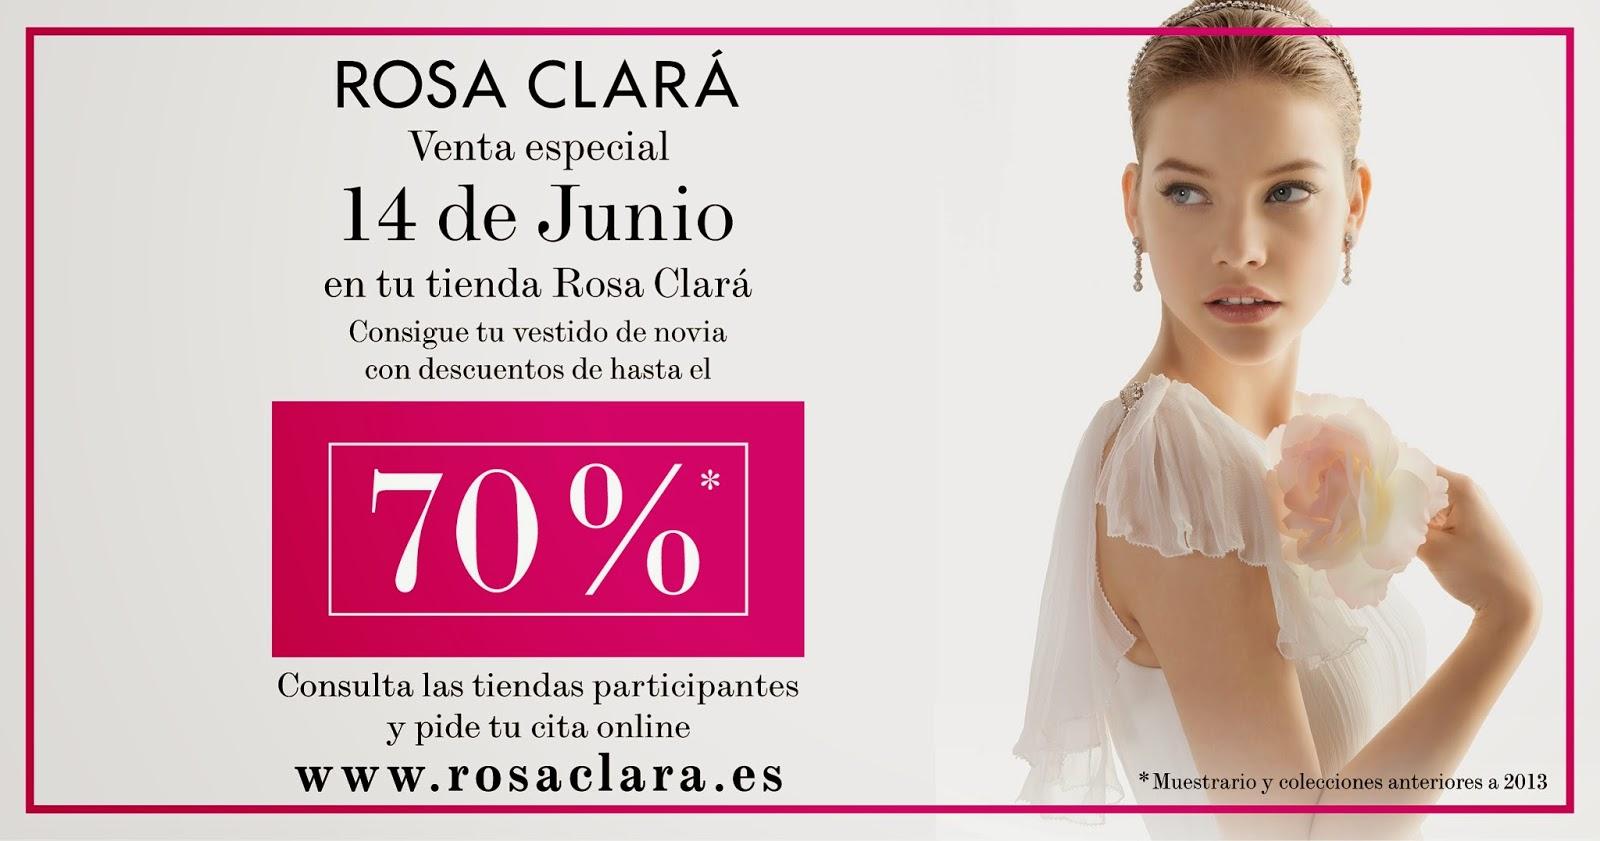 venta especial vestidos novia rosa clara blog bodas mi boda gratis